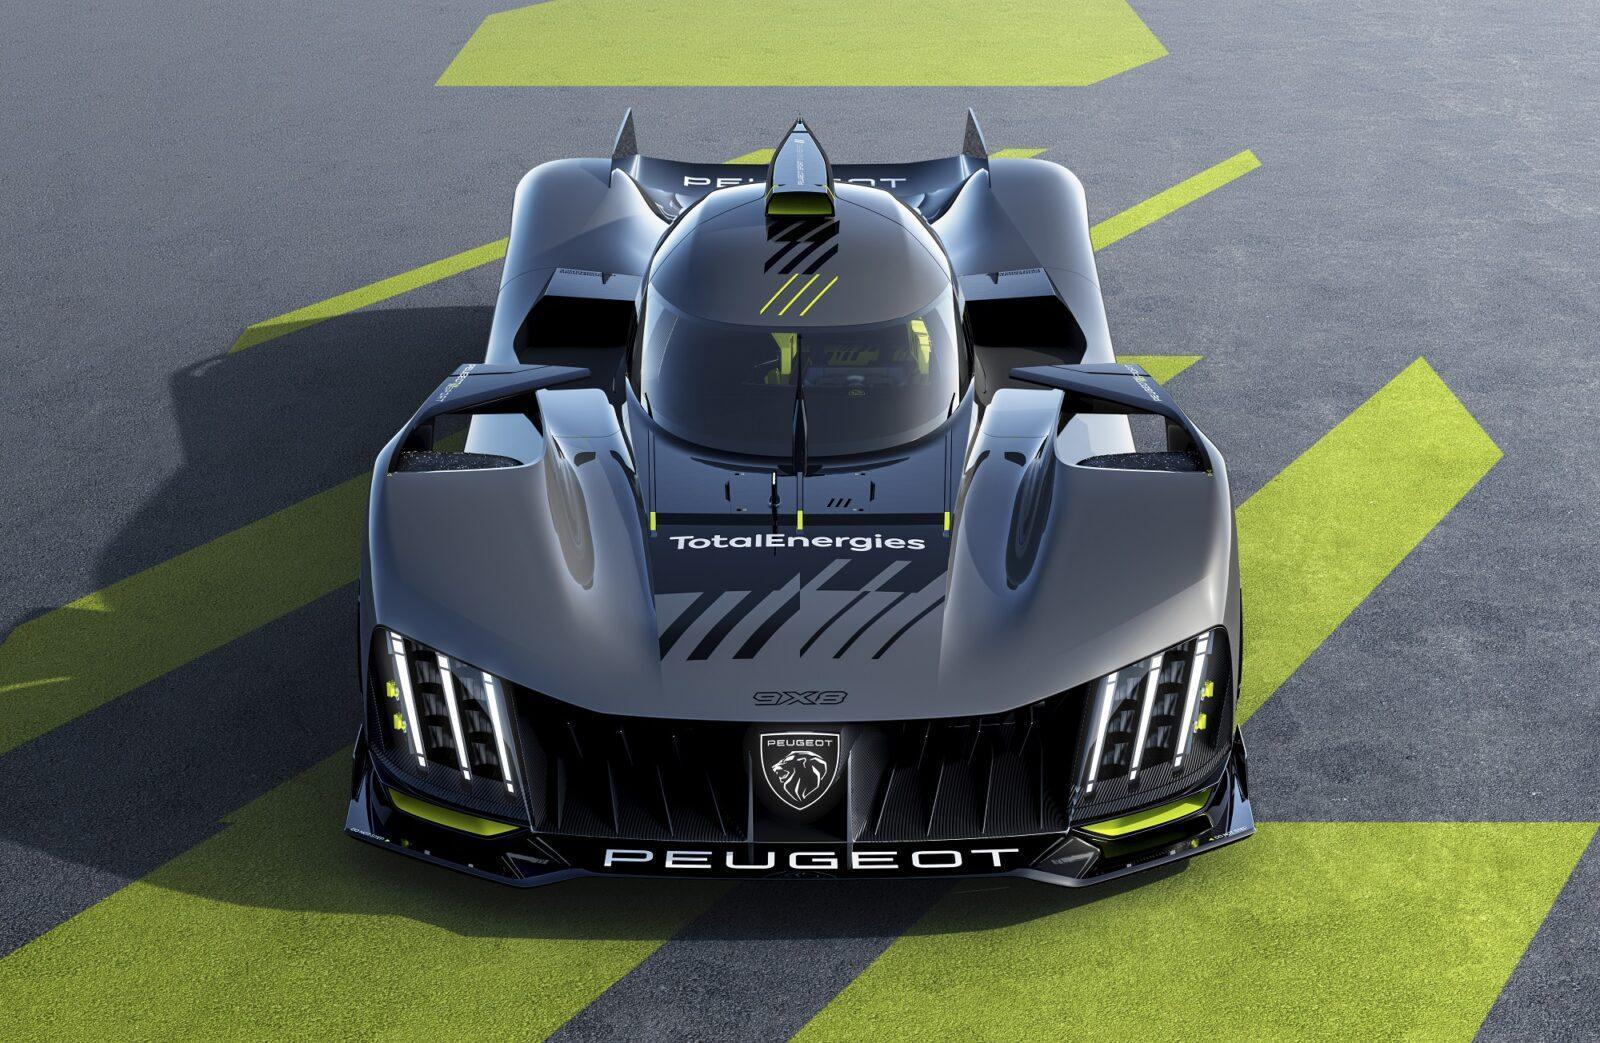 Вышел новый гиперкар Peugeot 9X8 (majeur kv 03 wec front)